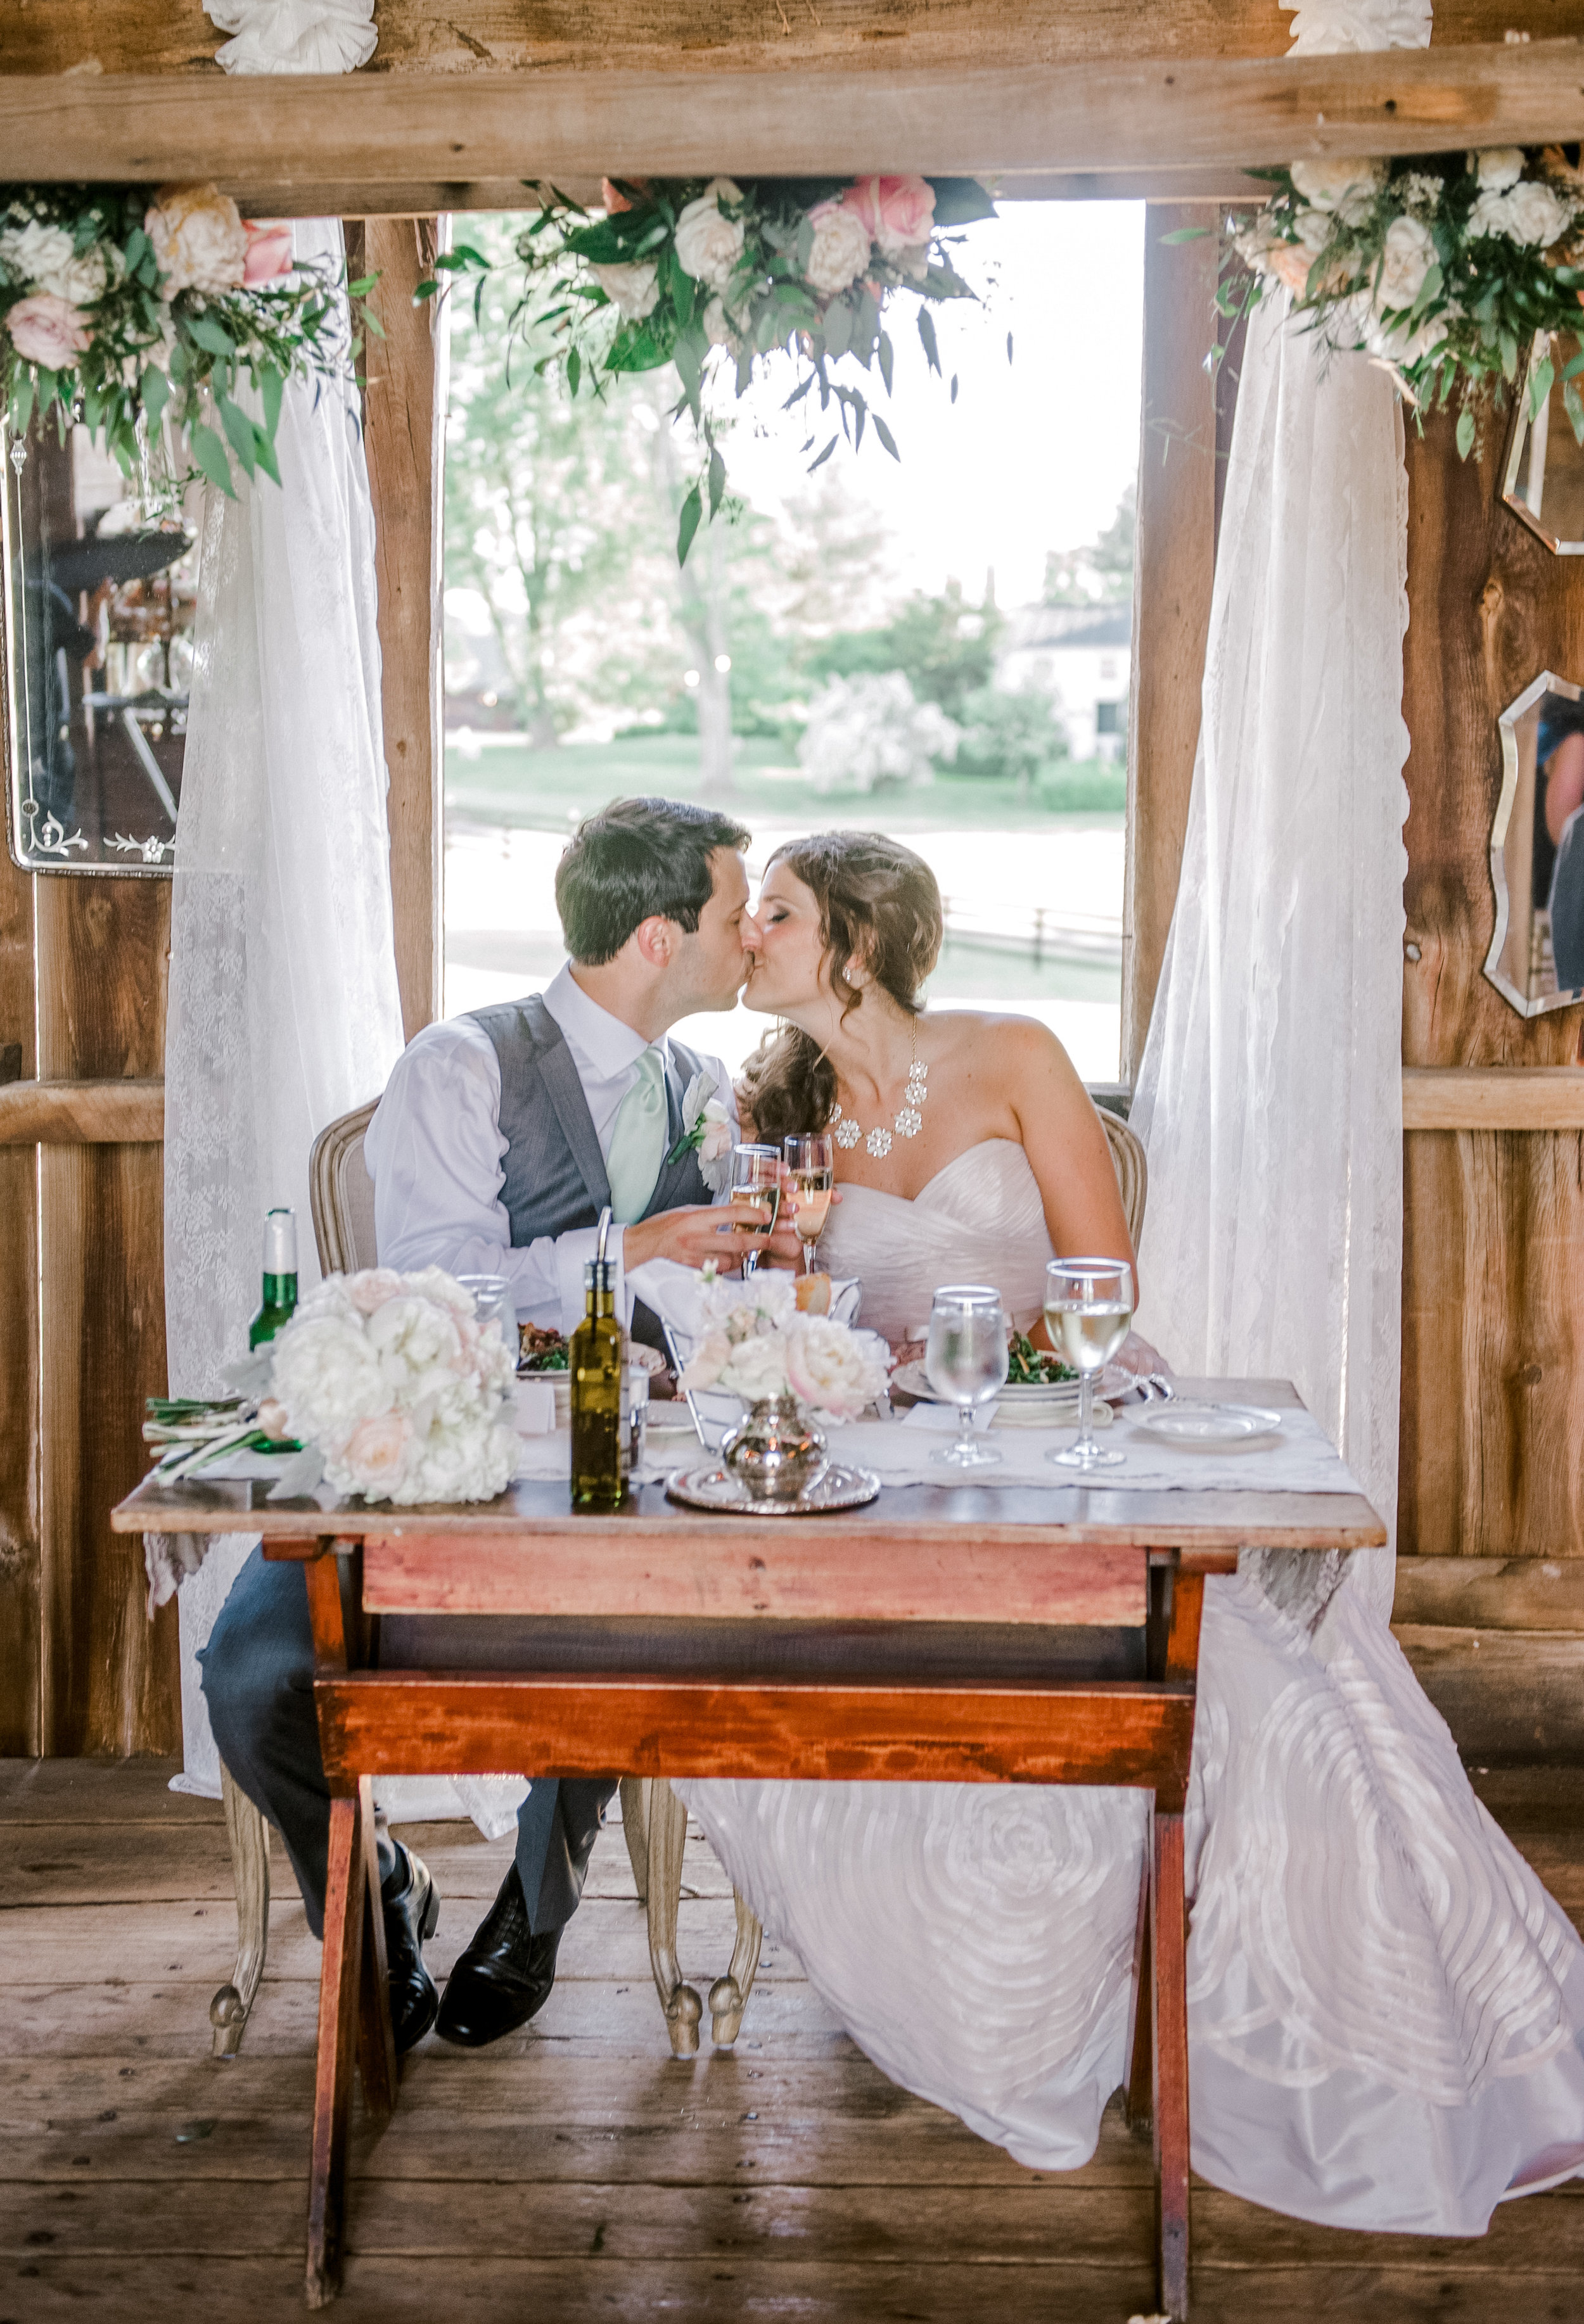 Silverbrook-Farm-Weddings-Virginia-44.jpg